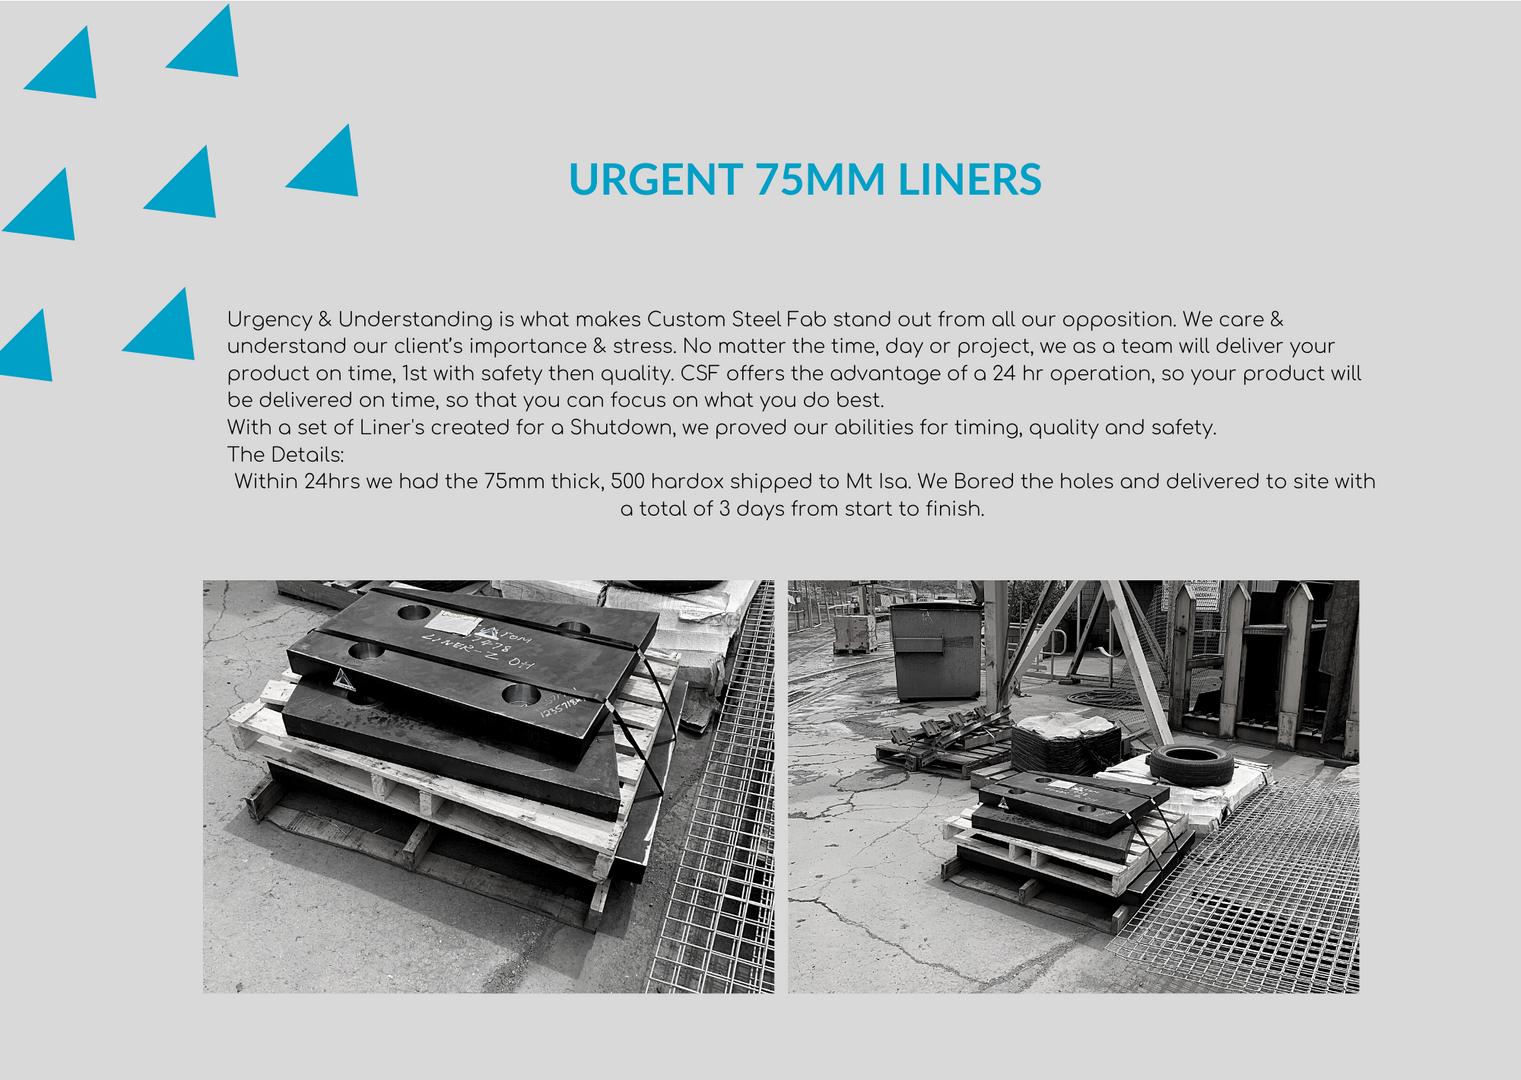 Urgent 75mm liners